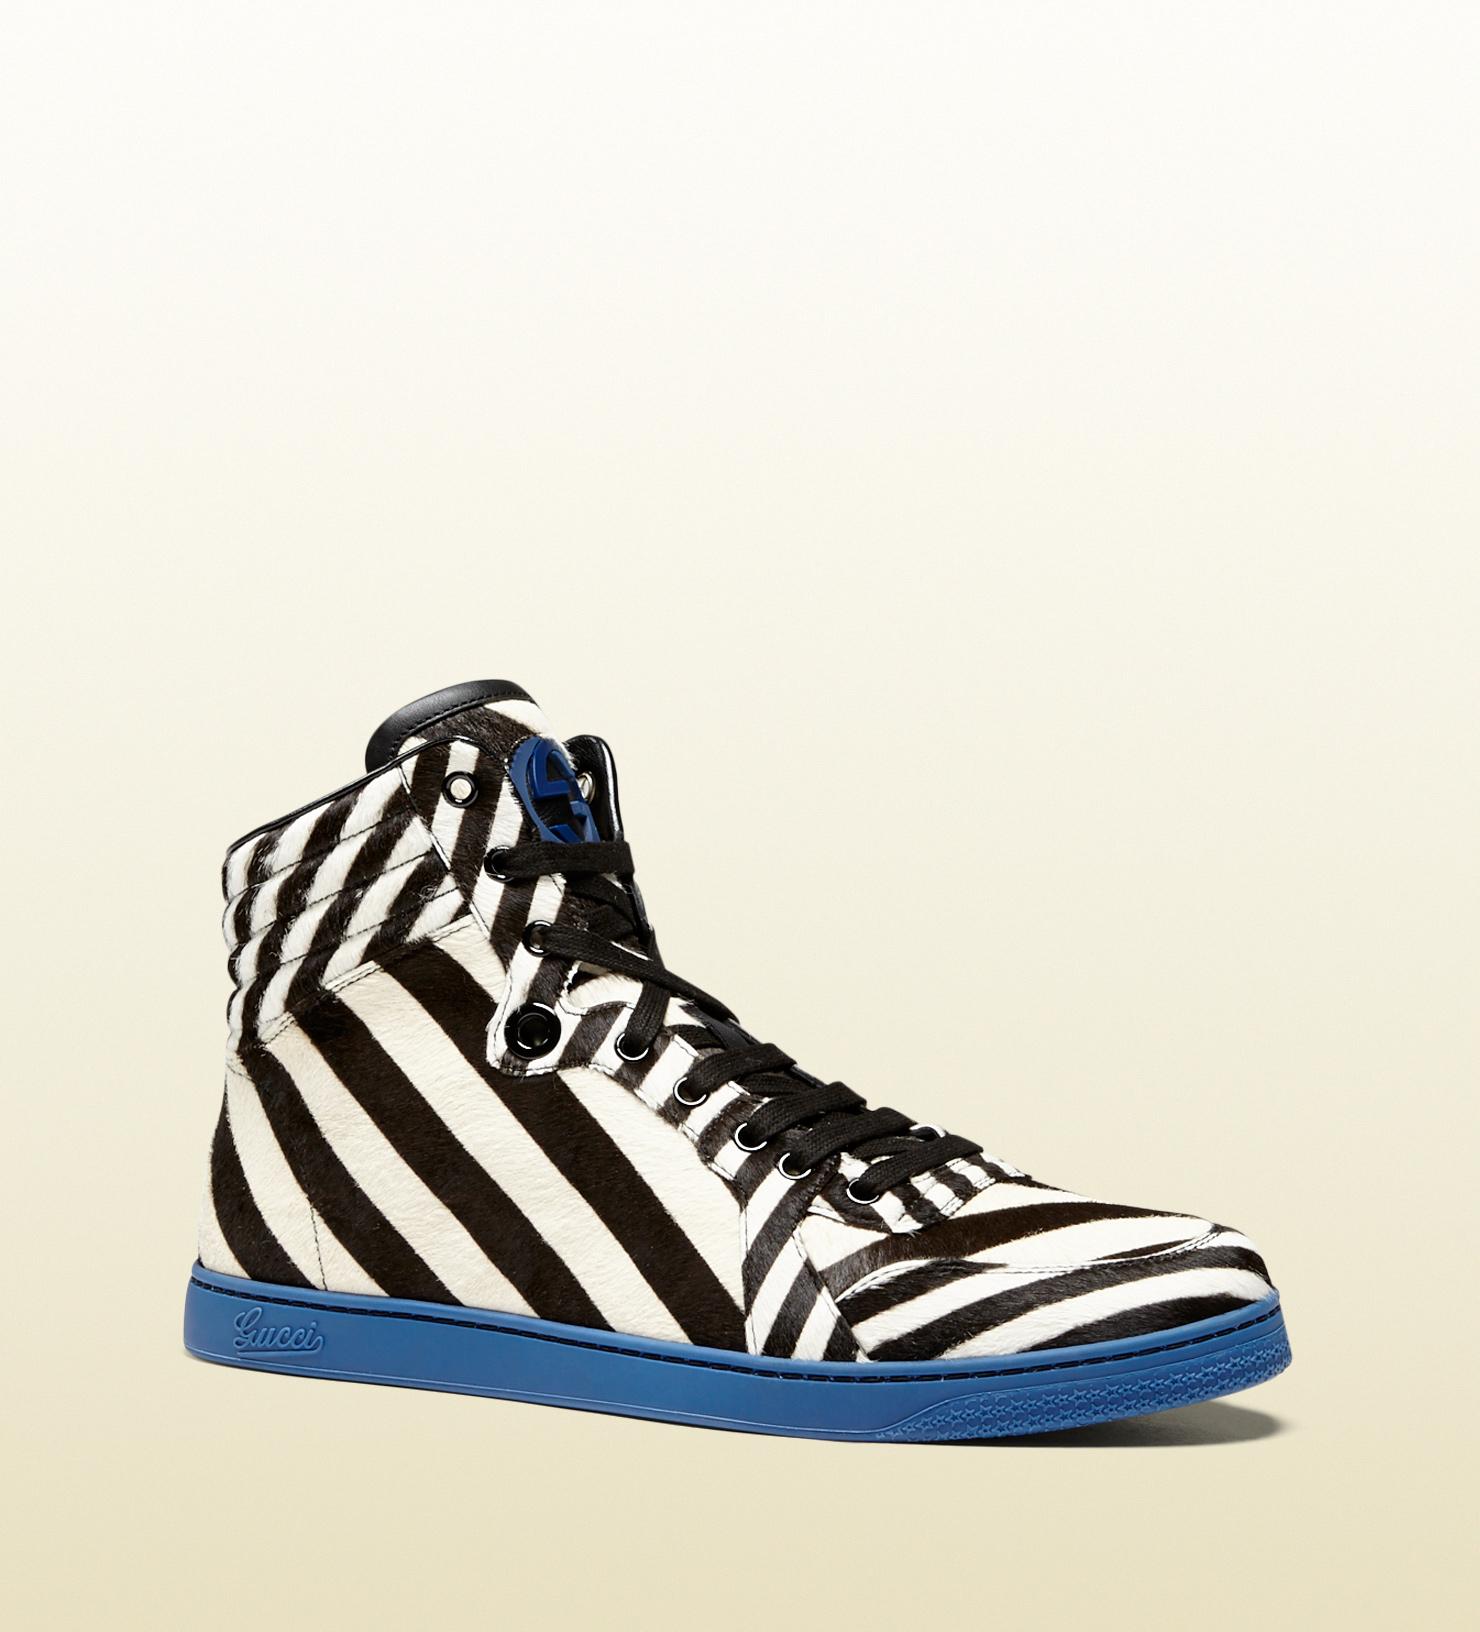 gucci zebra shoes. gallery gucci zebra shoes